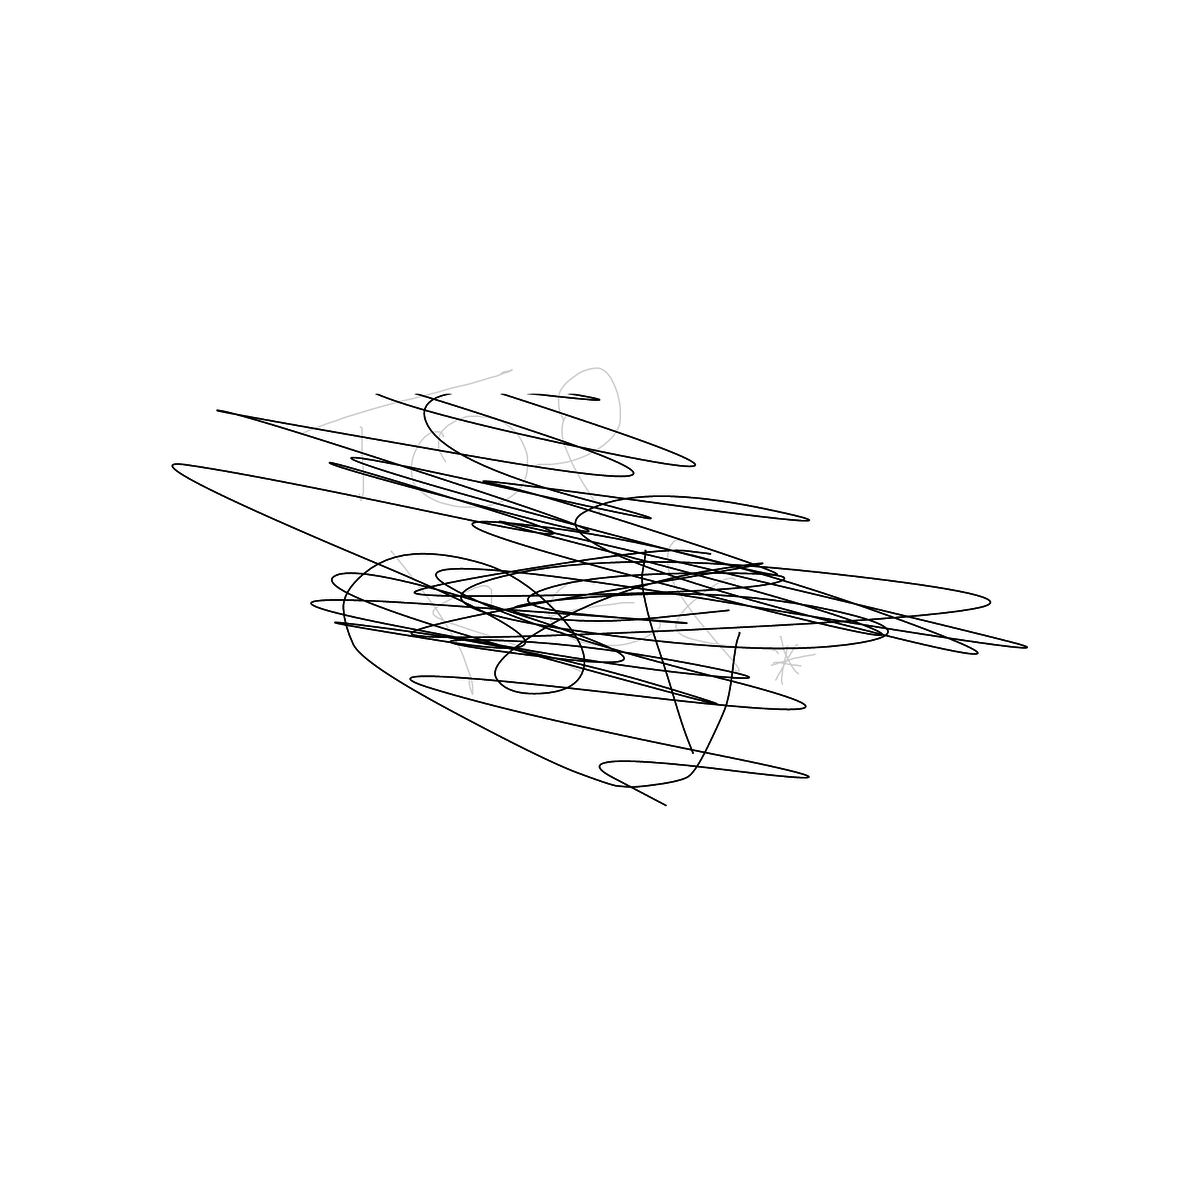 BAAAM drawing#3014 lat:41.5243644714355500lng: -8.4160852432250980